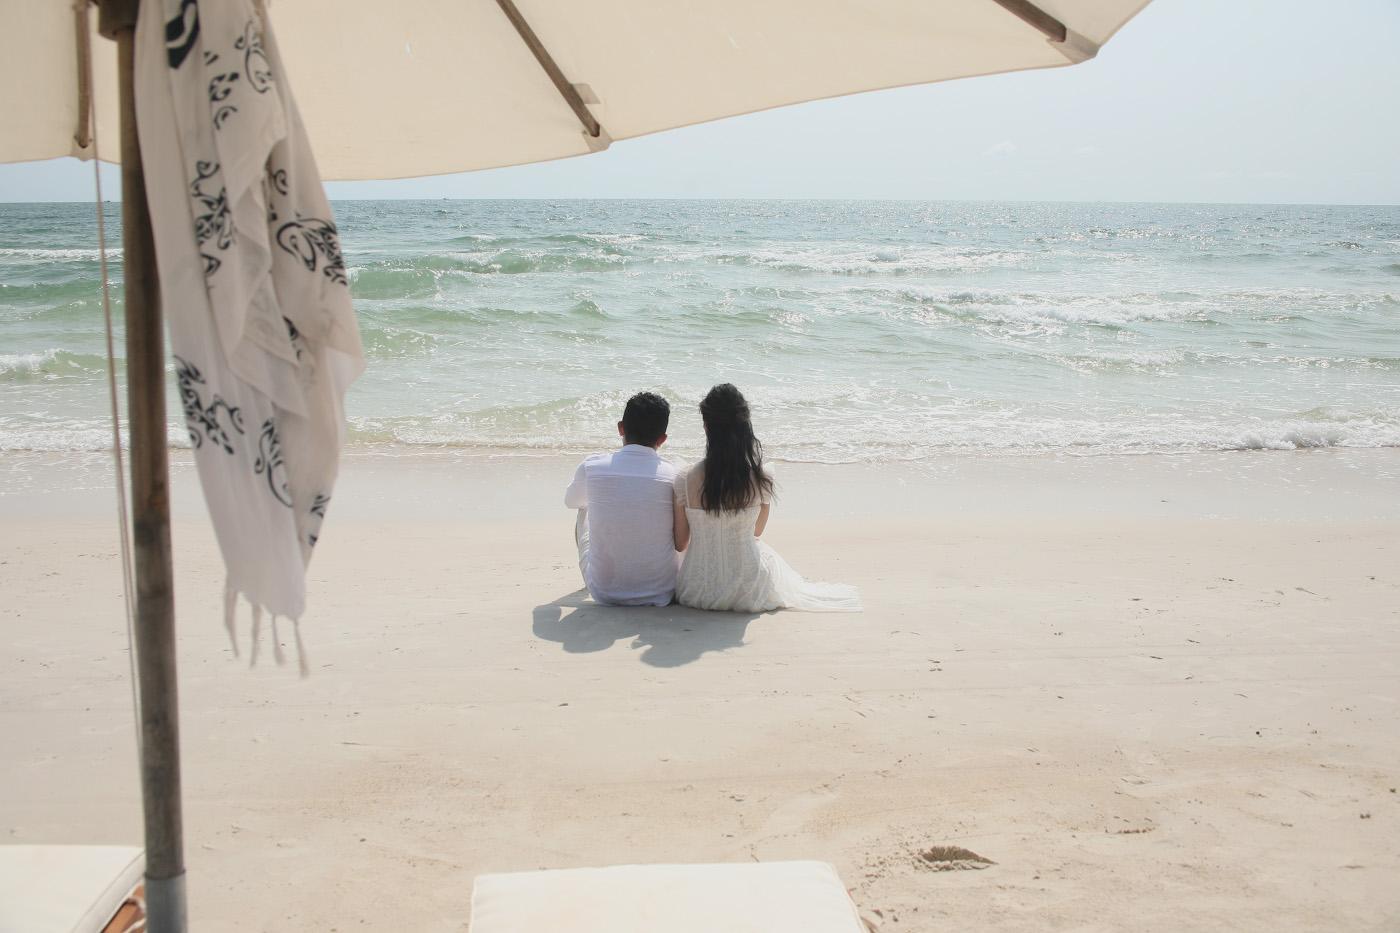 Фото 9. Влюблённая парочка на пляже Бай Сао острова Фукуок. 1/500, 10.0, 250, 80.